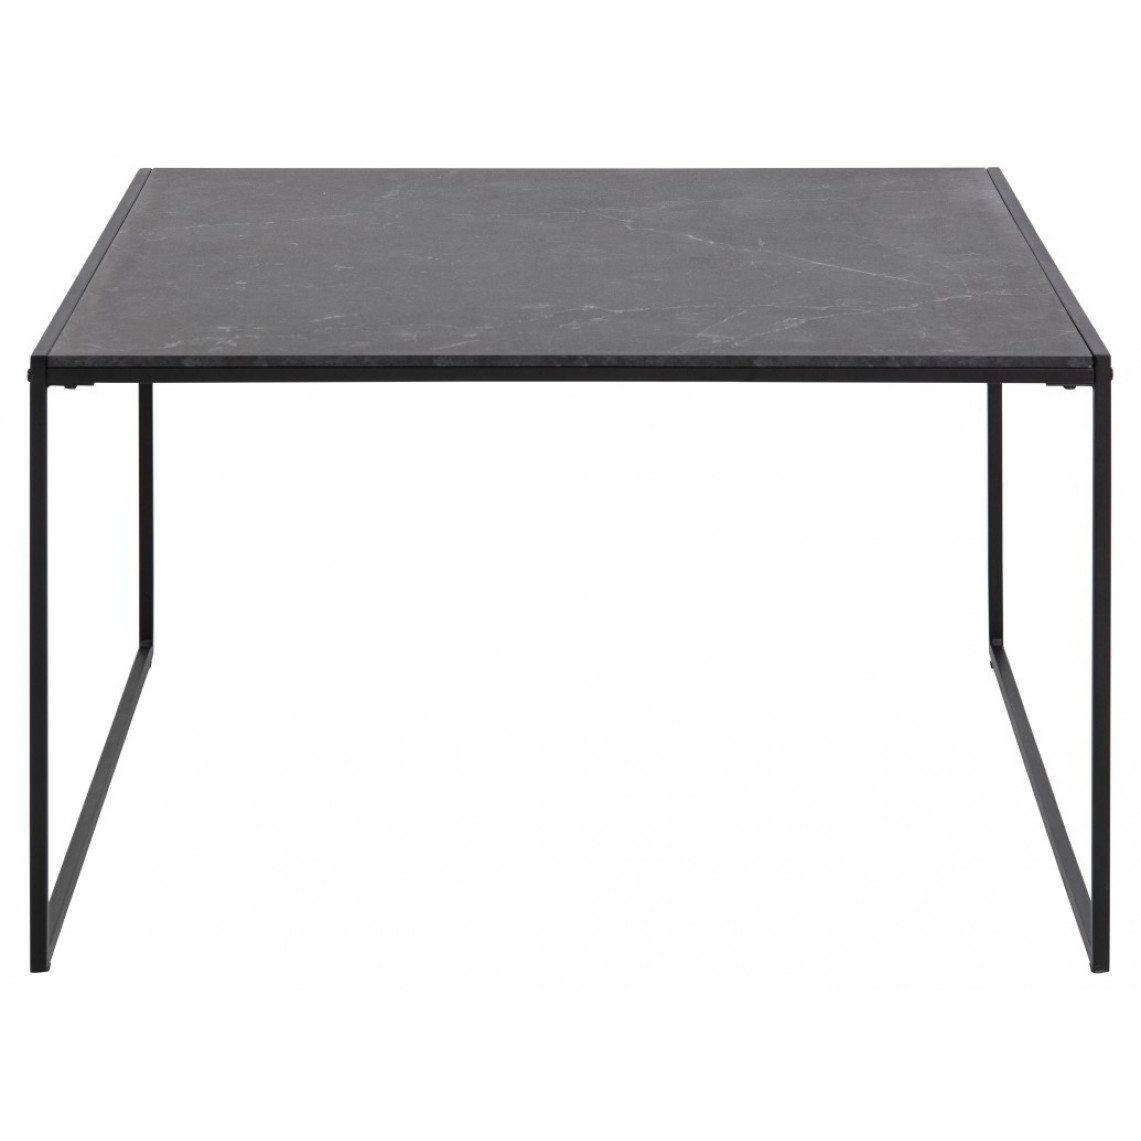 Coffee Table Infinity 80 x 80 cm | Black